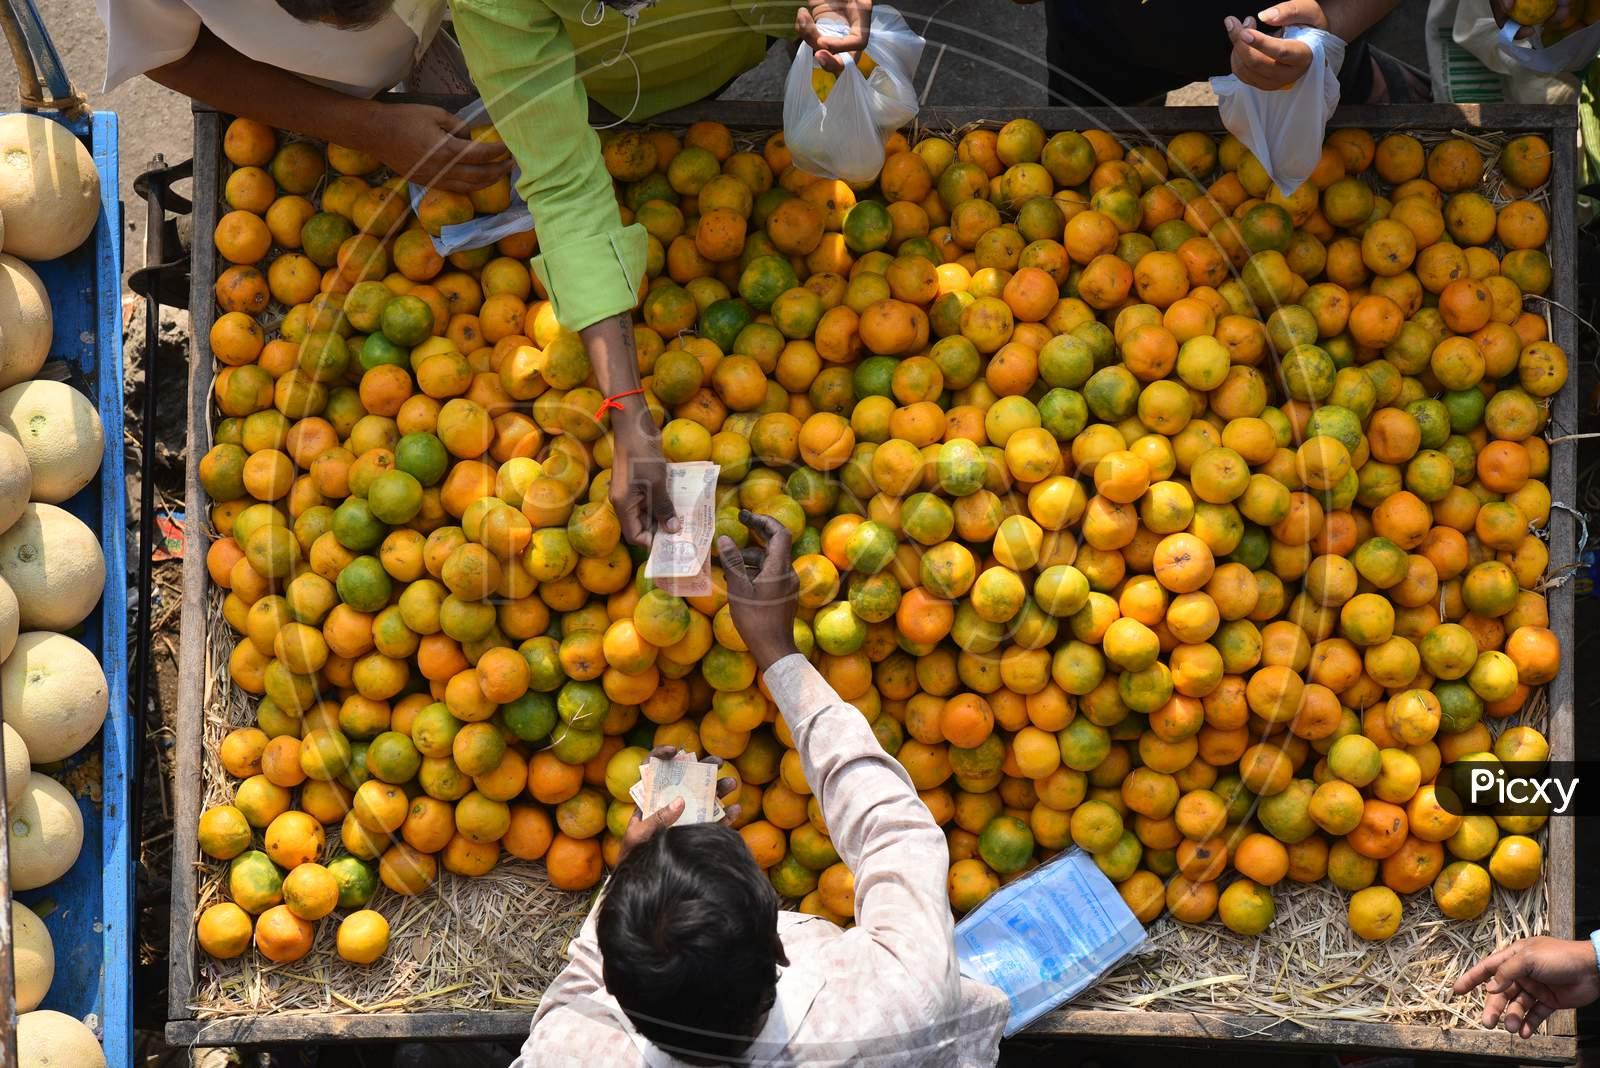 People buy citric acid rich fruits like orange, mausambi fruits to increase their immunity amid corona virus pandemic in Hyderabad